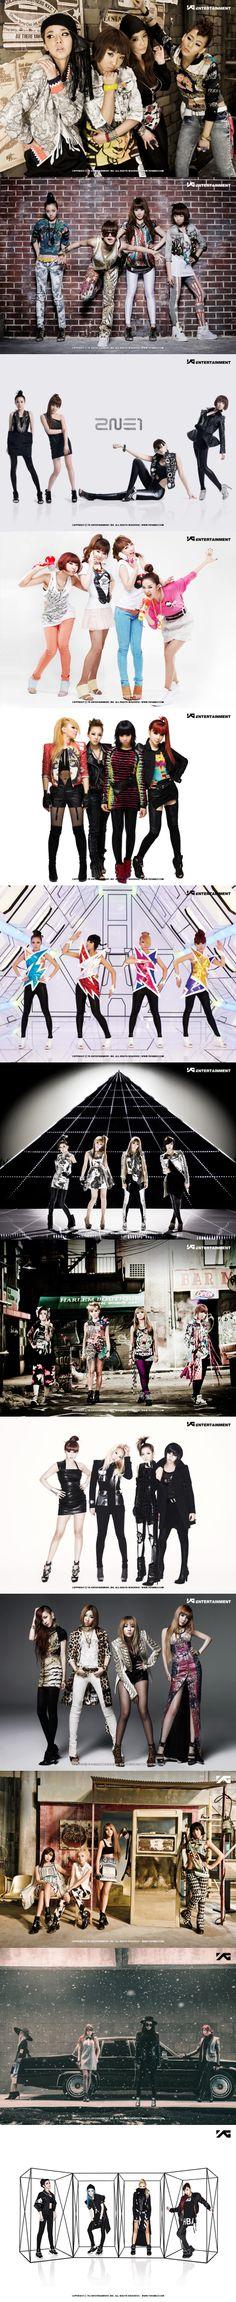 """new evolution"" of 2NE1 | since 2009"